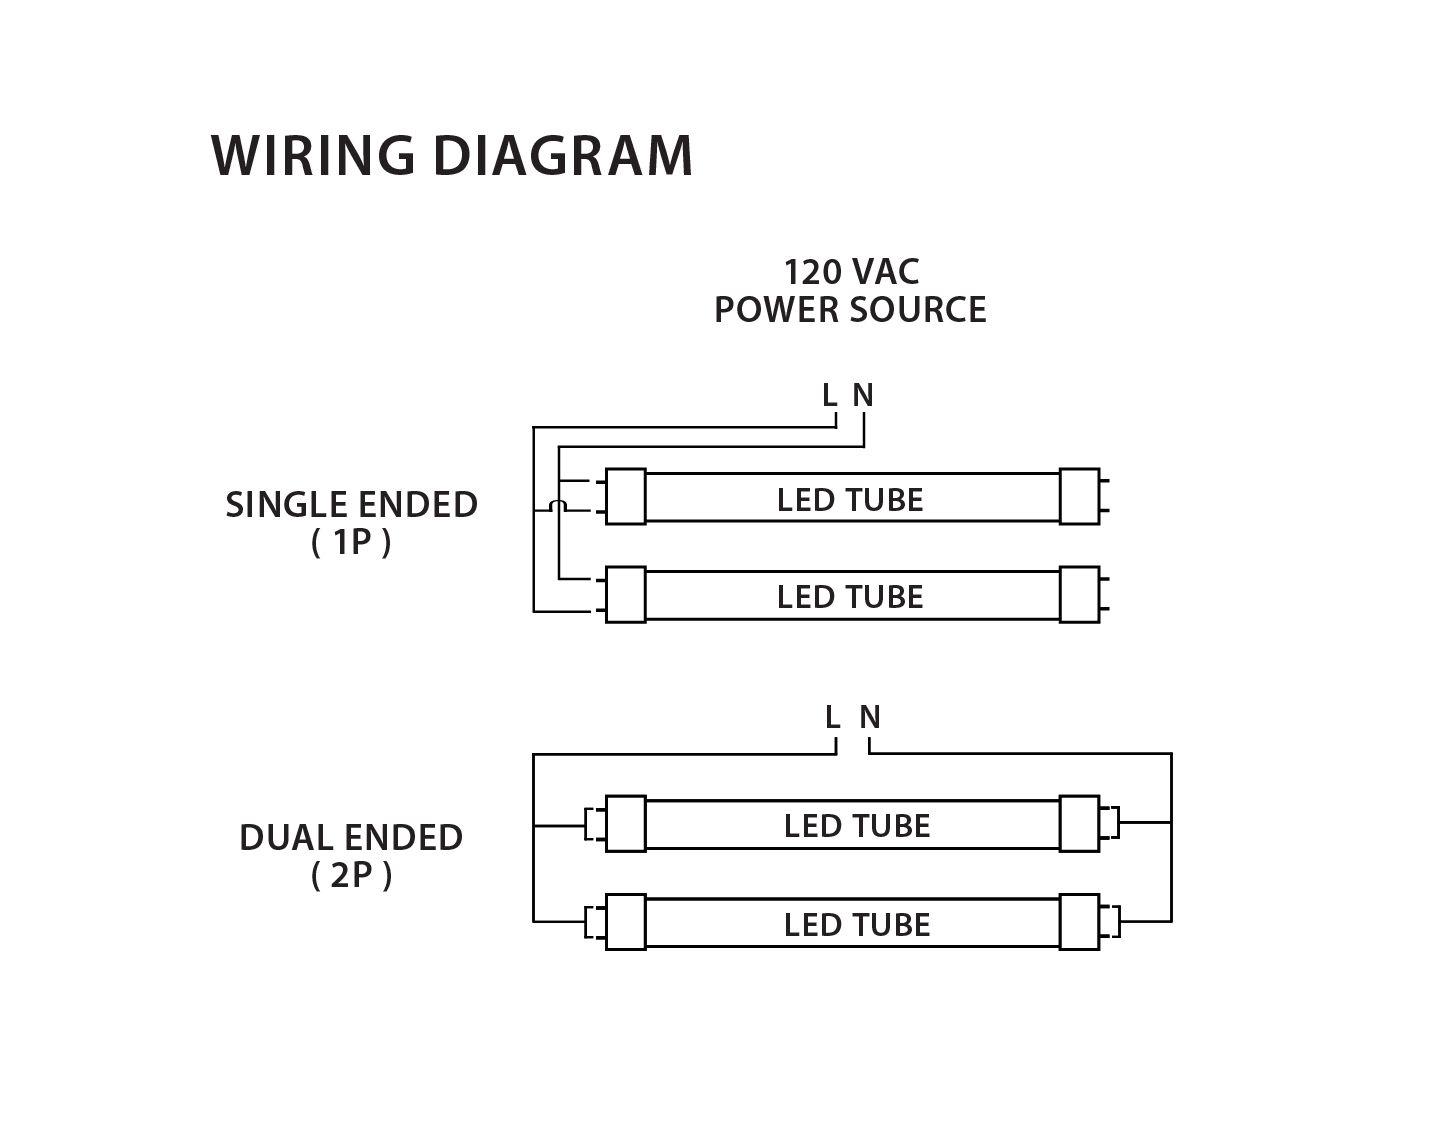 Foot Led V Wiring Diagram on 12v led wiring diagram, t8 tube wiring diagram, circuit breaker wiring diagram, 120 volt wiring diagram, led chip diagram, ac wiring diagram, led schematic diagram, led strip wiring diagram, t8 led wiring diagram, low voltage lighting wiring diagram, led driver diagram, 120v power supply wiring, 220 dryer plug wiring diagram, hot water heater thermostat wiring diagram, 240v single phase wiring diagram, 120vac wiring diagram, 240v plug wiring diagram, wiring 1 phase wiring diagram, light wiring diagram, ge low voltage wiring diagram,